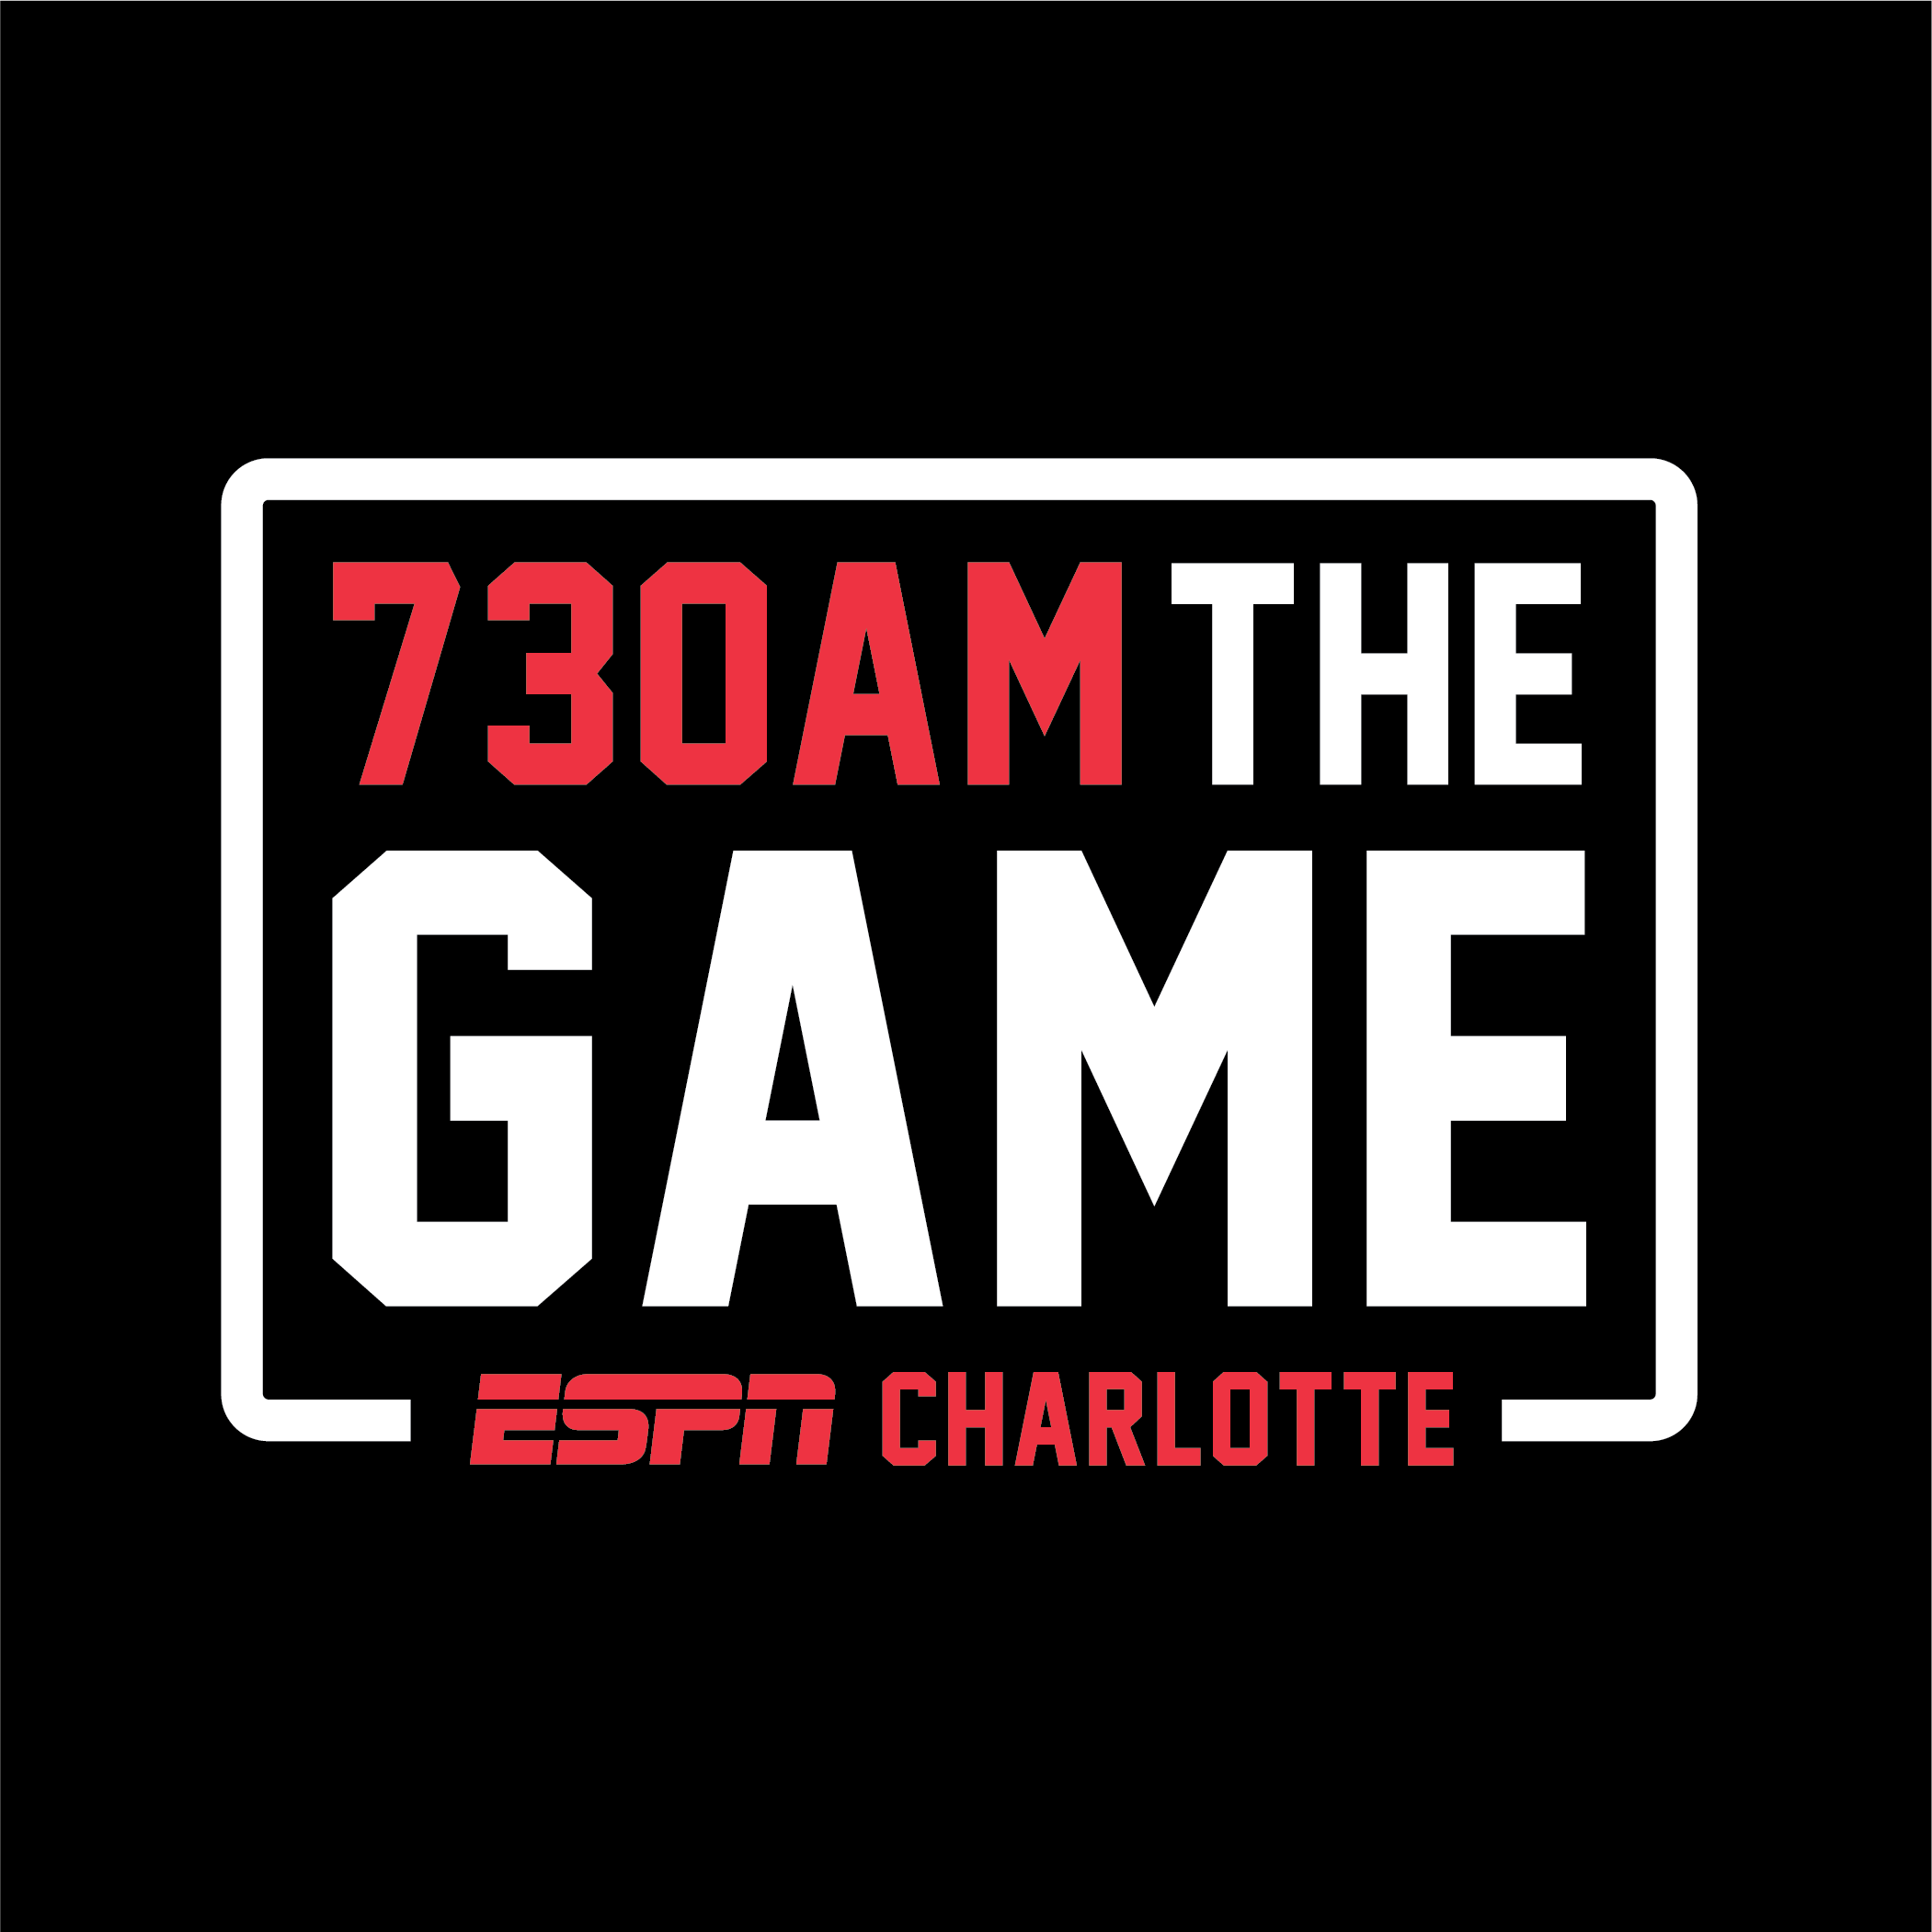 ESPN Charlotte - OFFICIAL PE101 MEDIA PARTNER